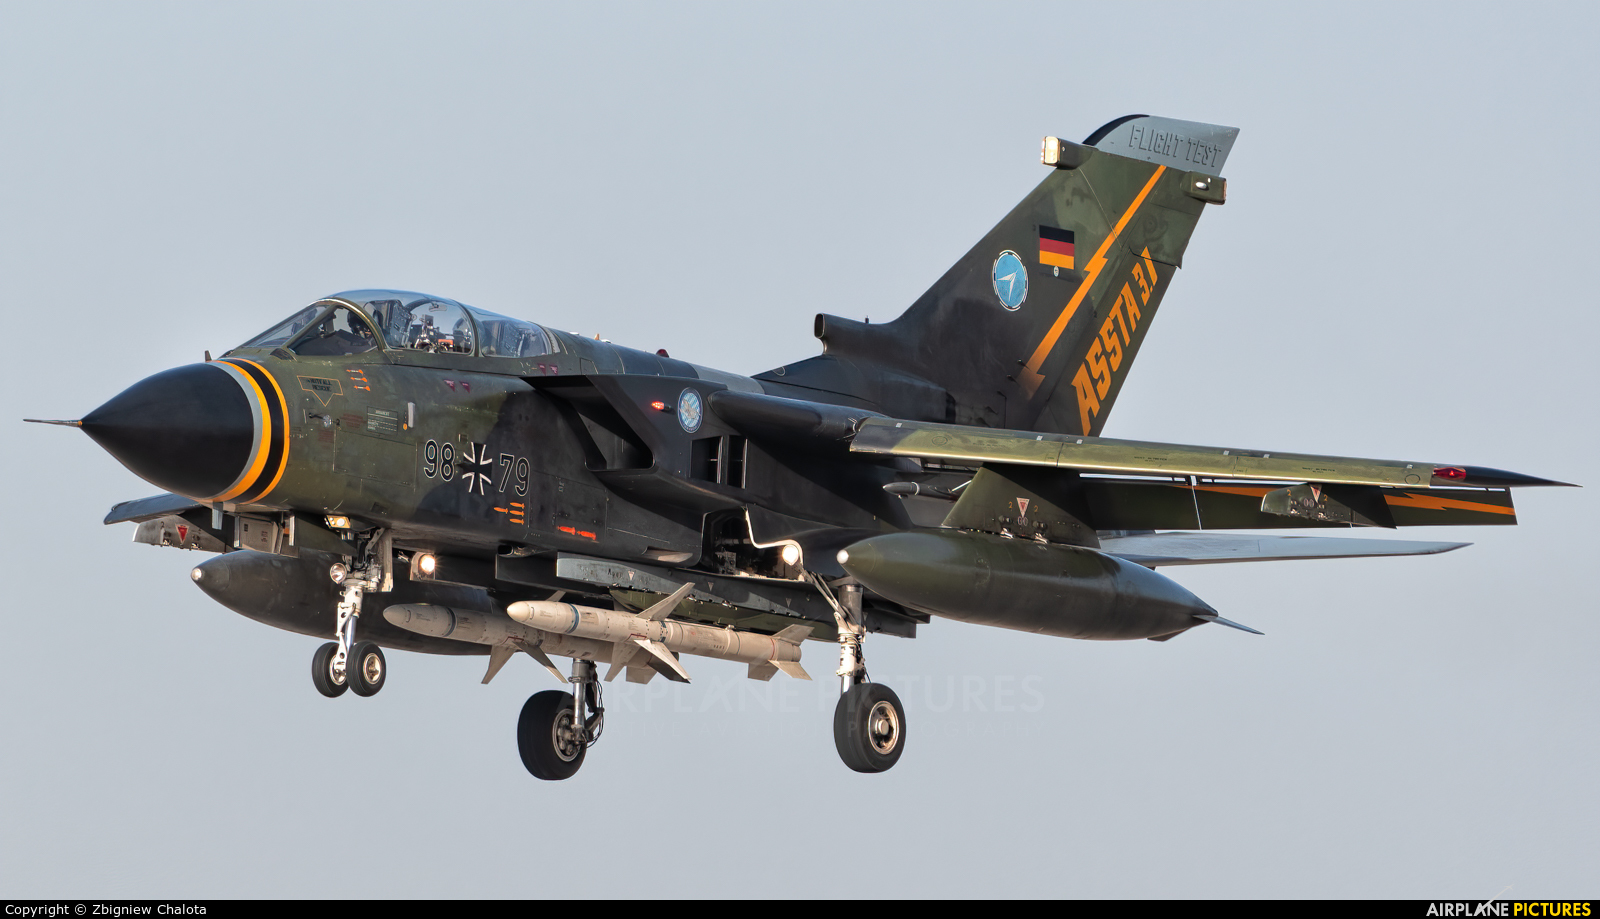 Germany - Air Force 98+79 aircraft at Ingolstadt - Manching